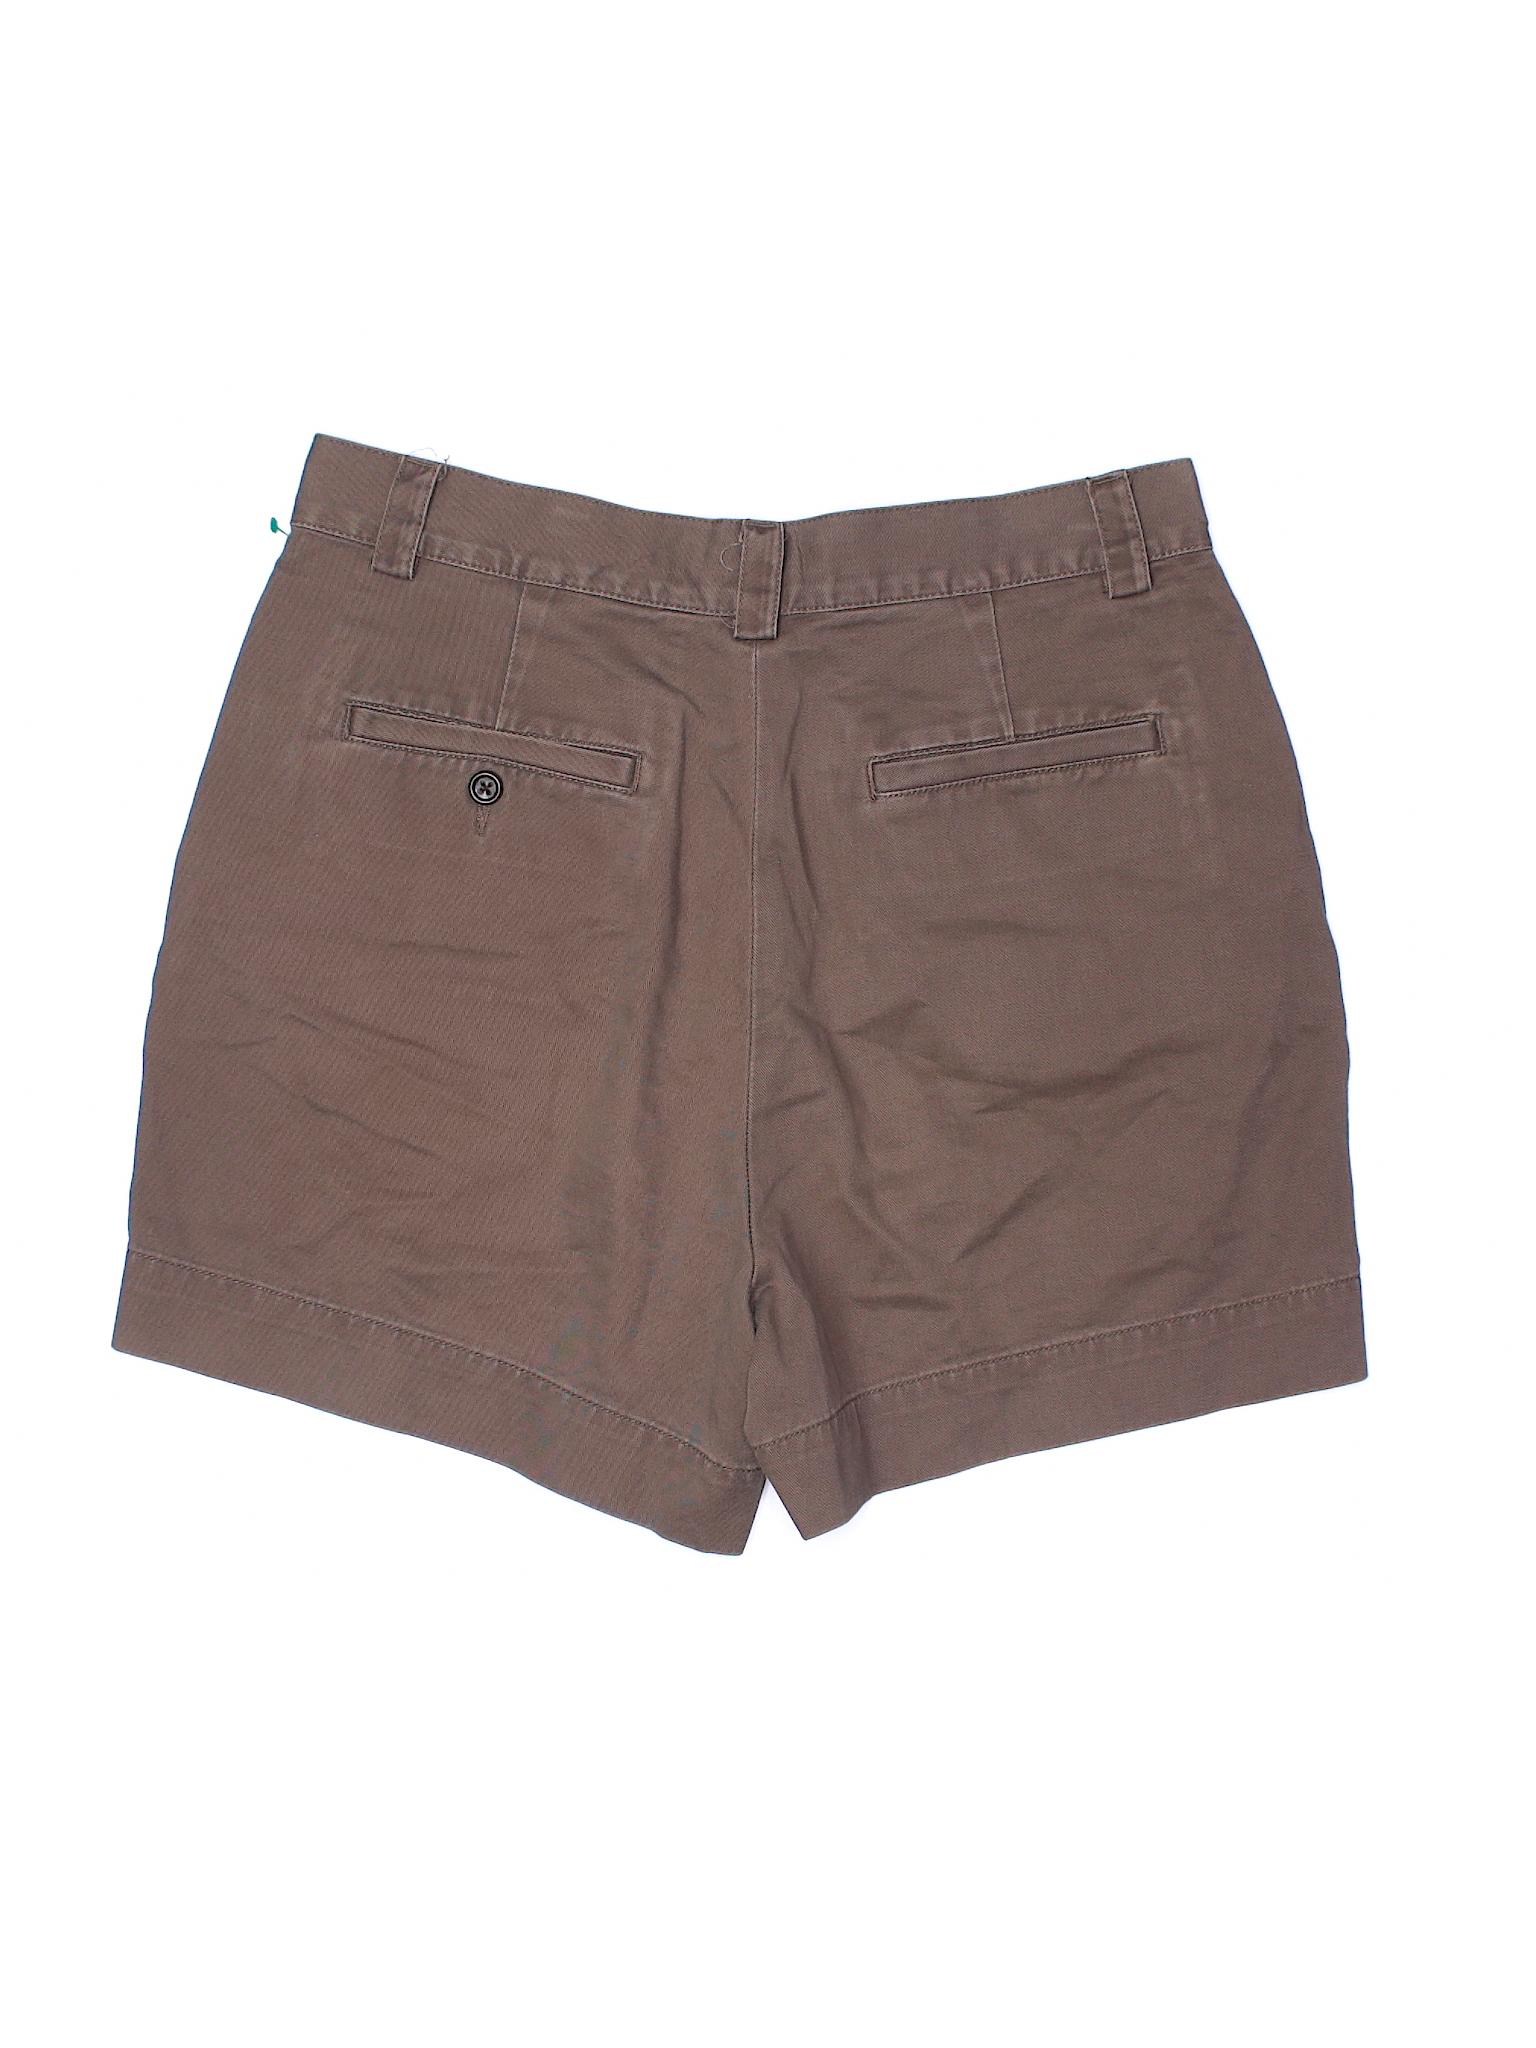 leisure Banana Republic Khaki Shorts Boutique Afdq64Wwq